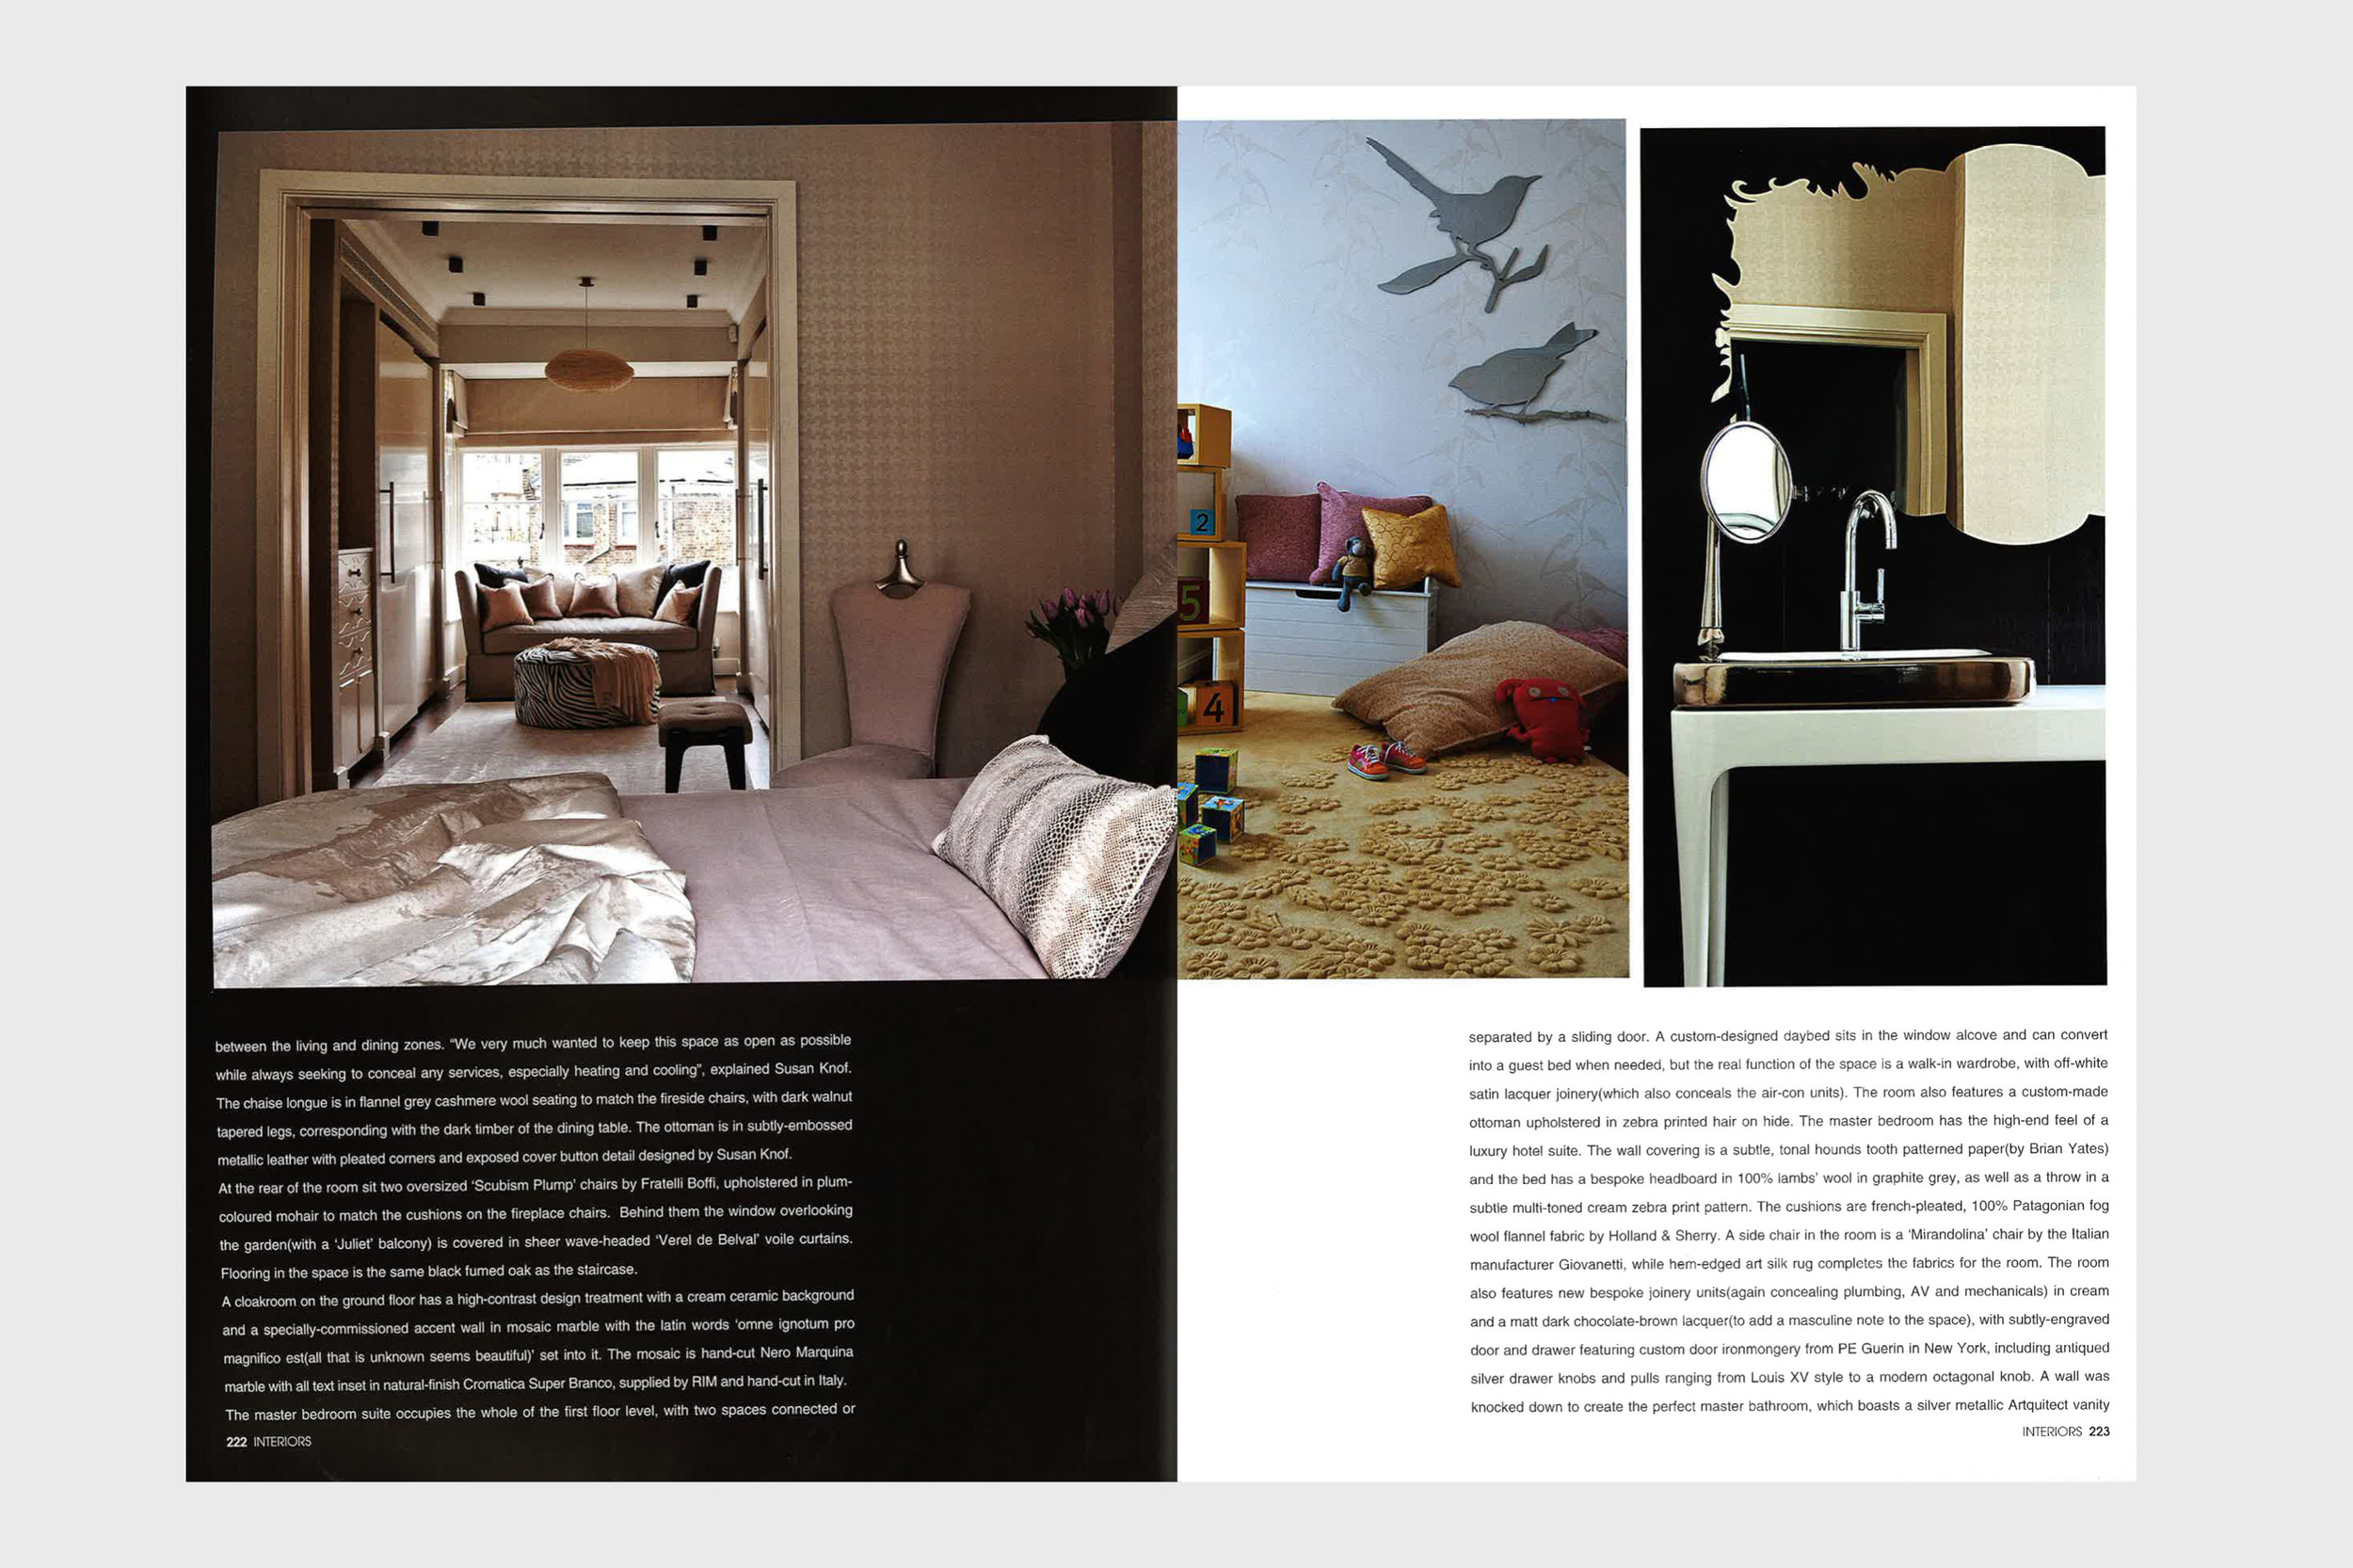 knof-press--interiors--2011-08_07.jpg